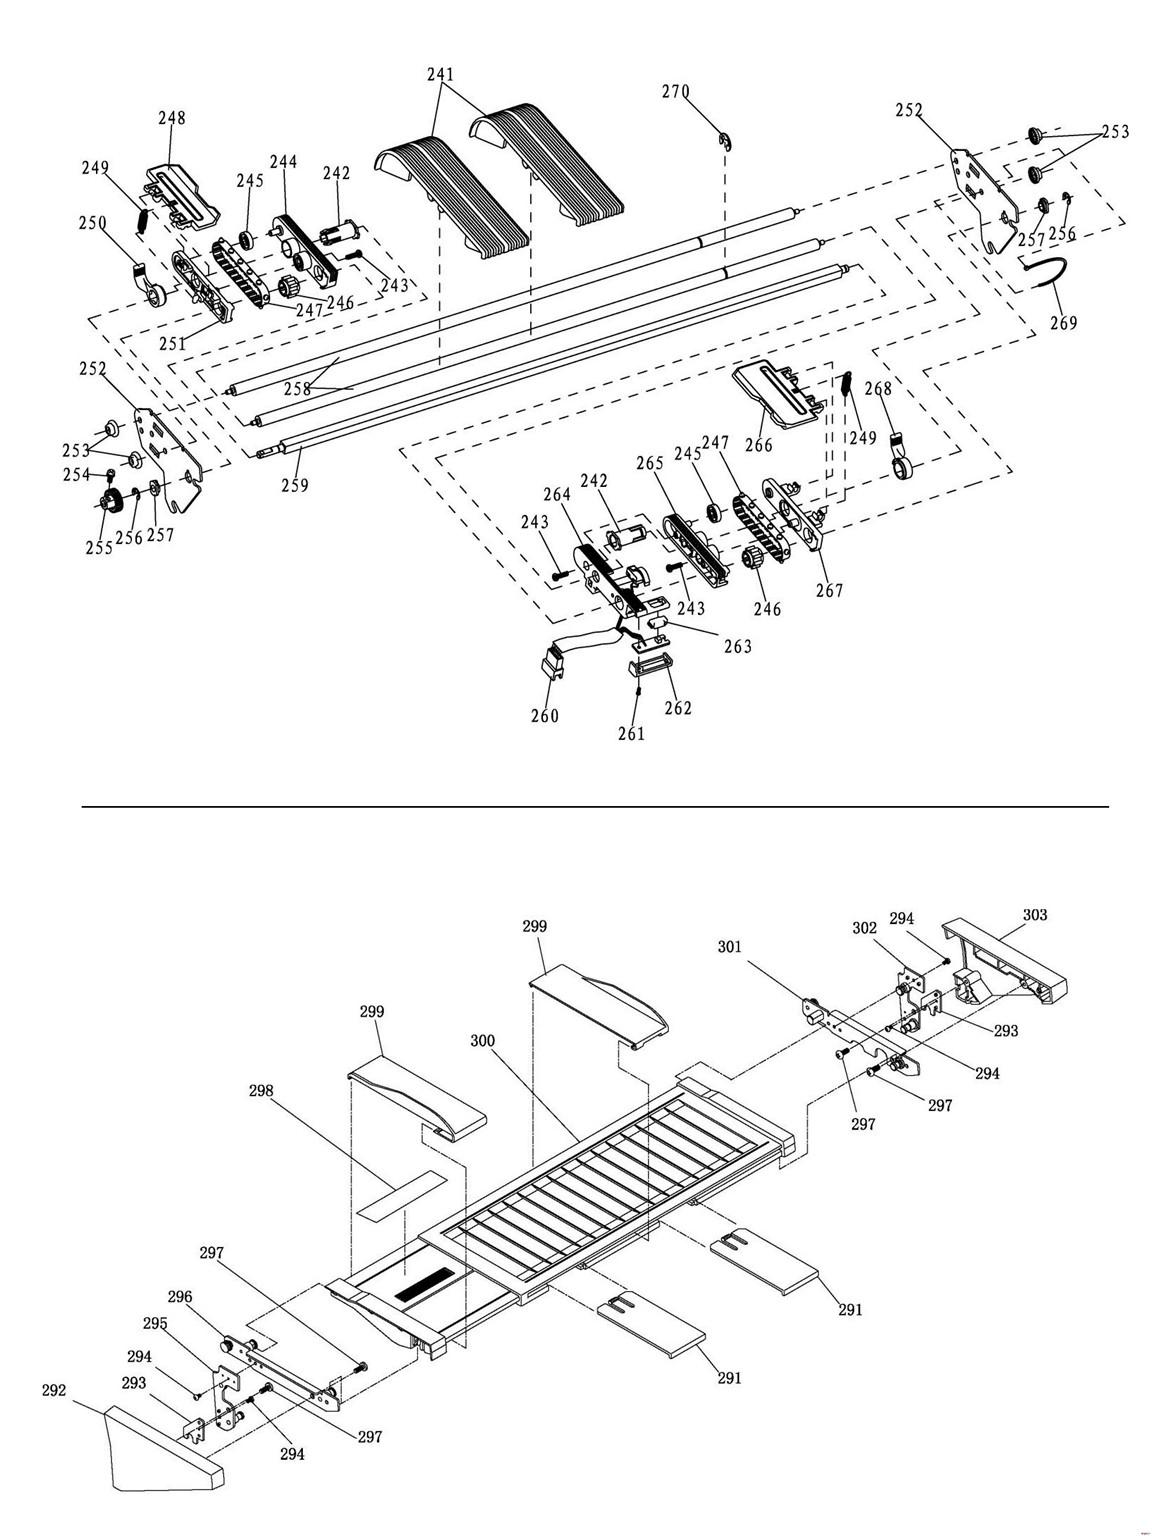 https://www.argecy.com/images/ACCEL-7450-Parts-4_cr.jpg